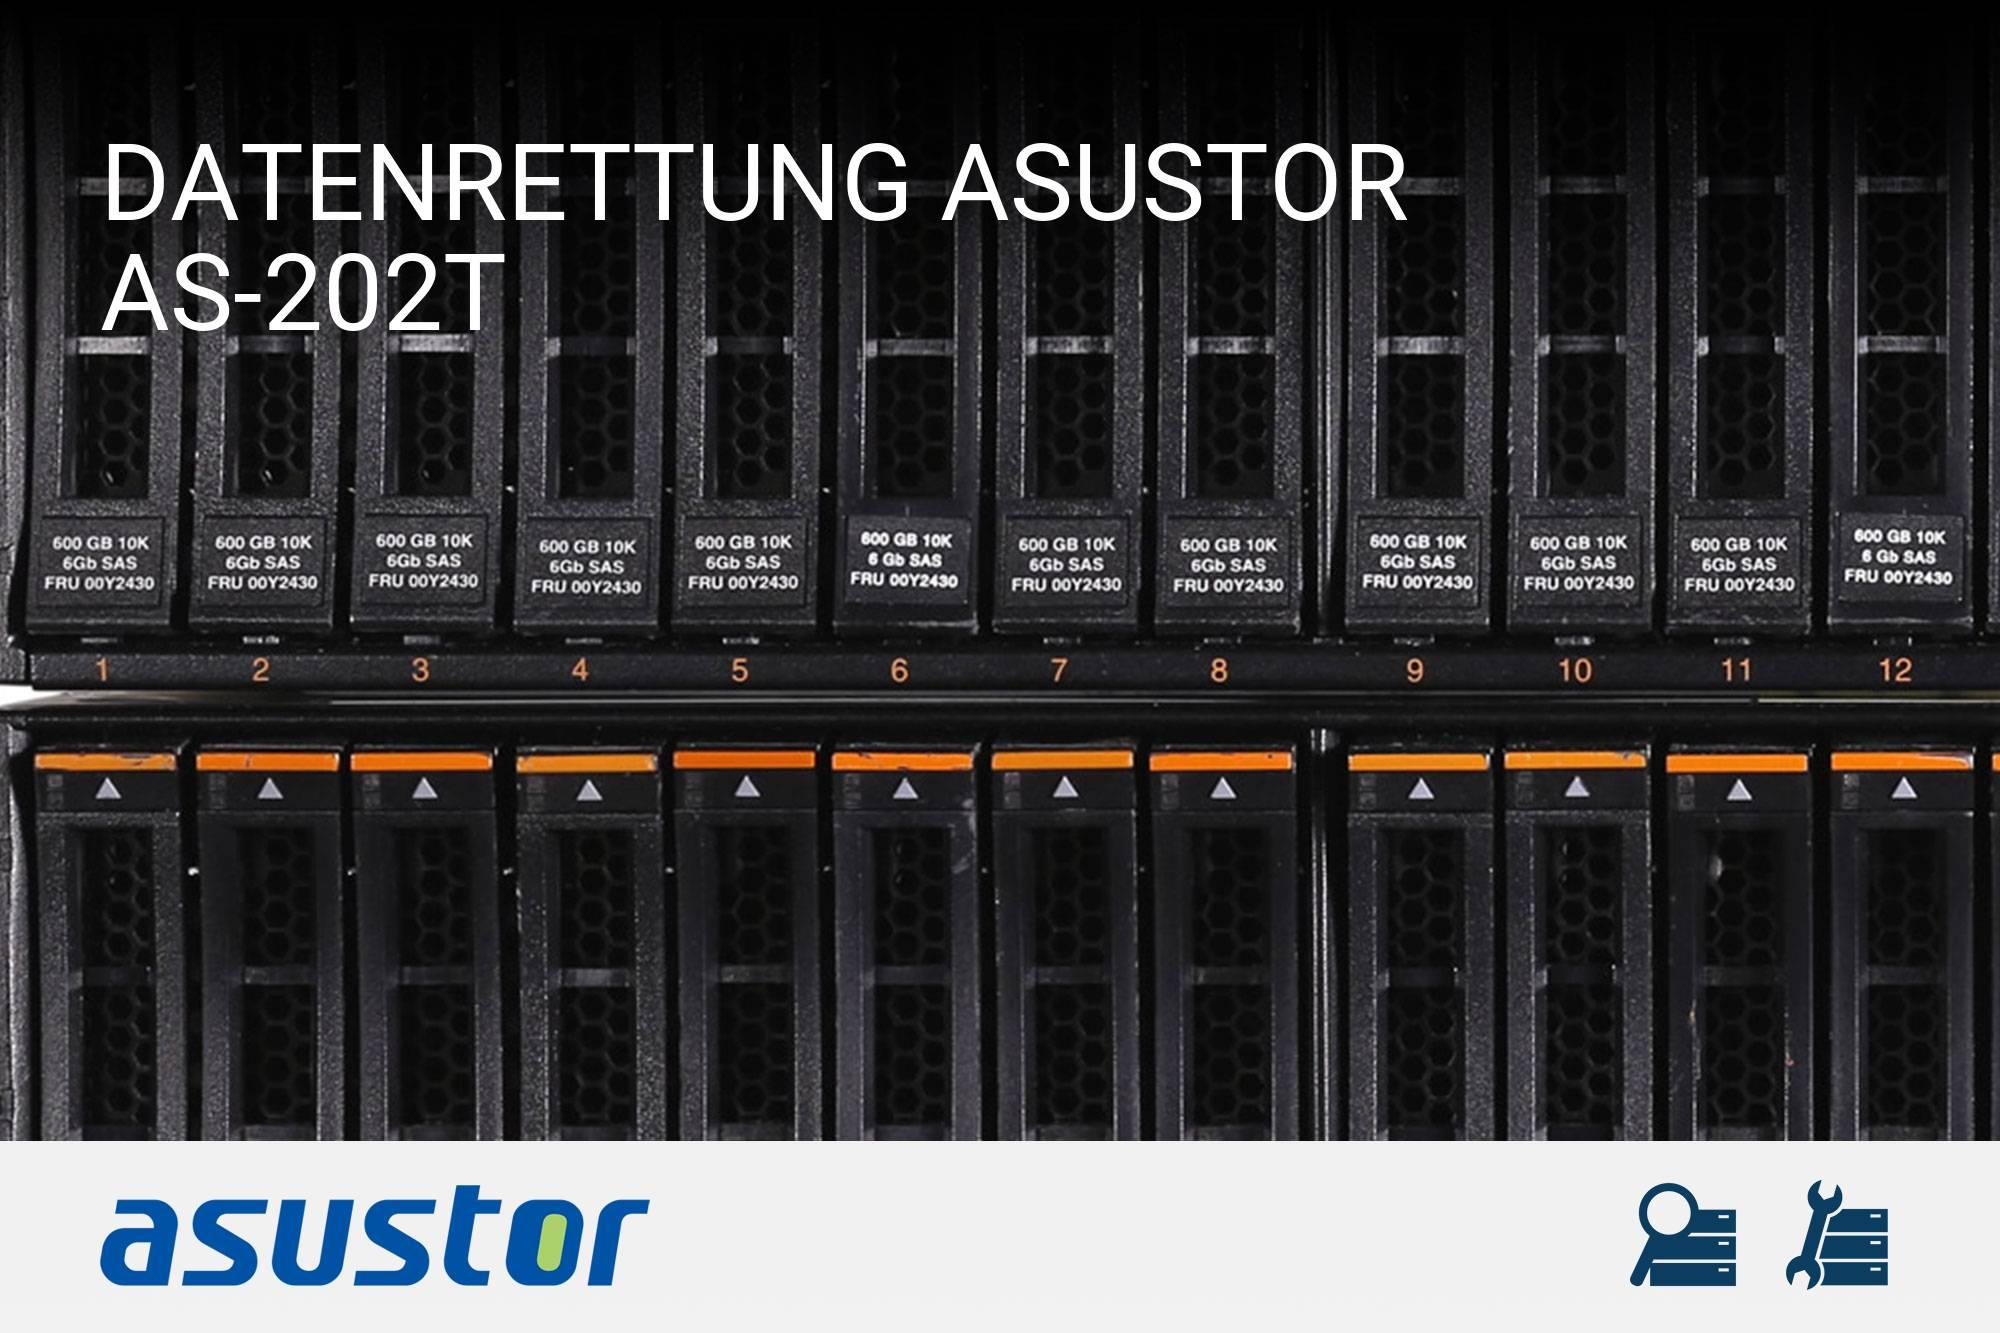 Asustor AS-202T